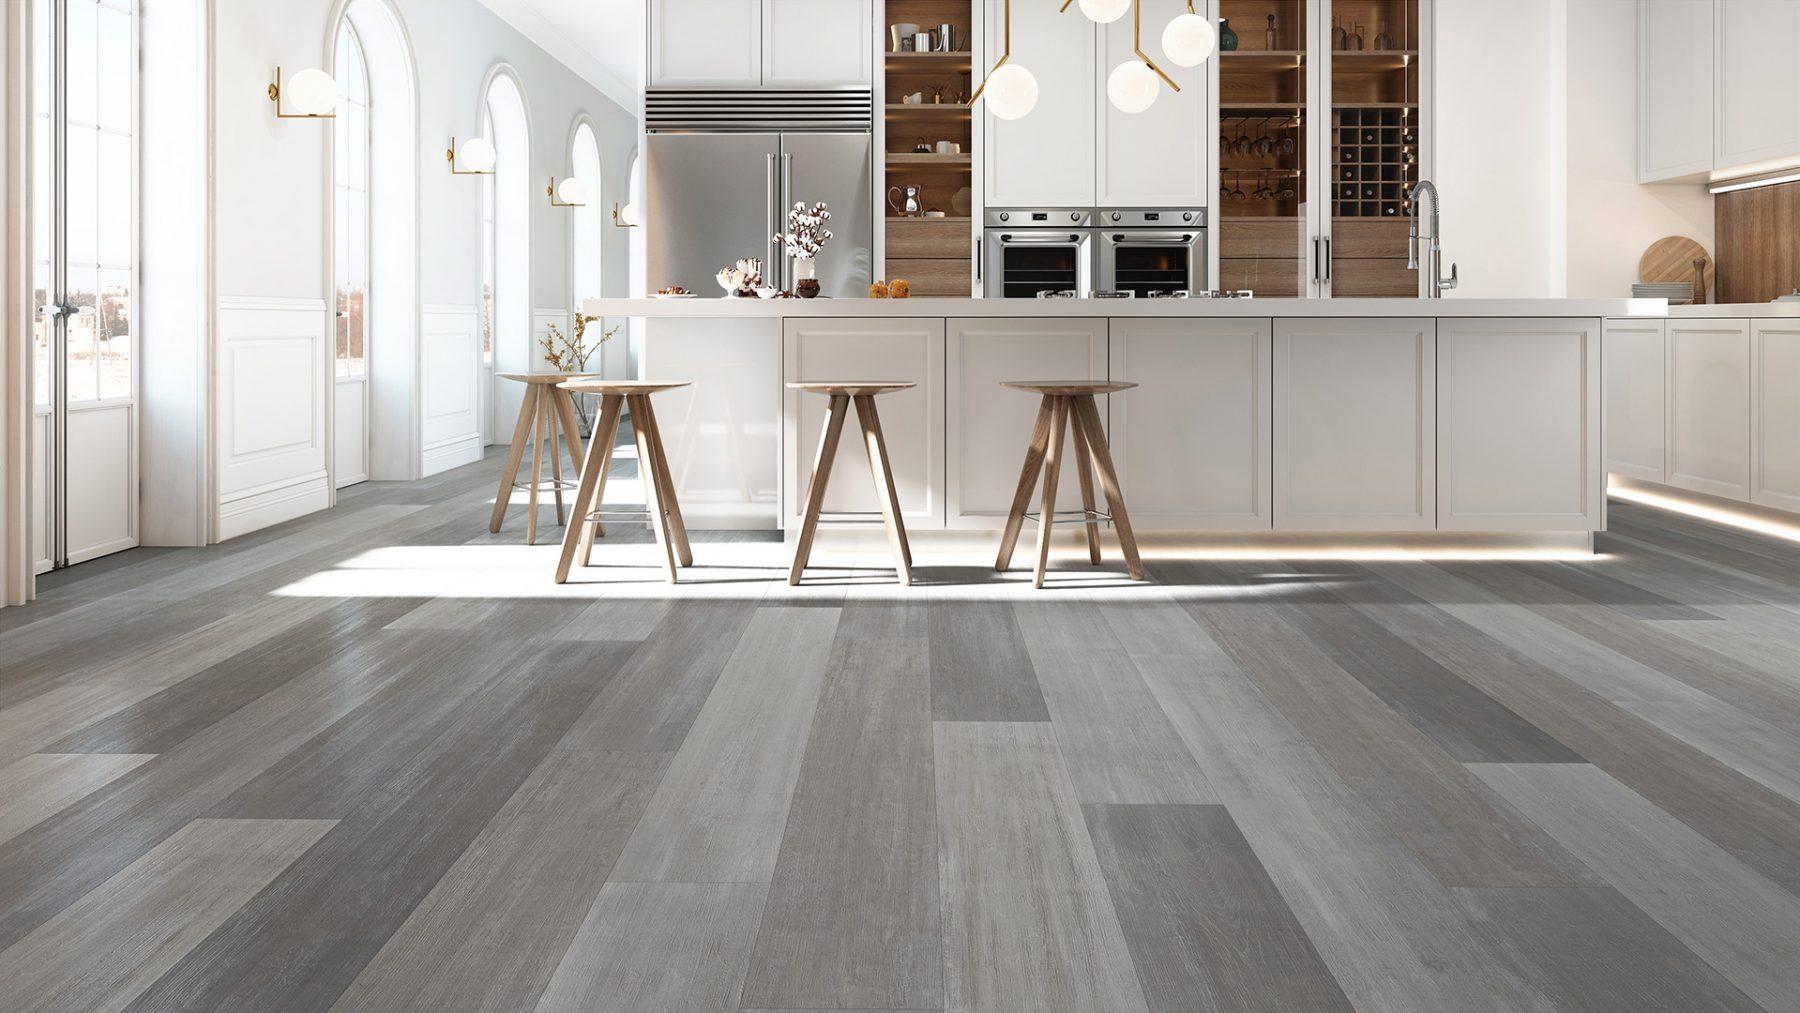 vray-3dsmax-render-kitchen-beautiful-light